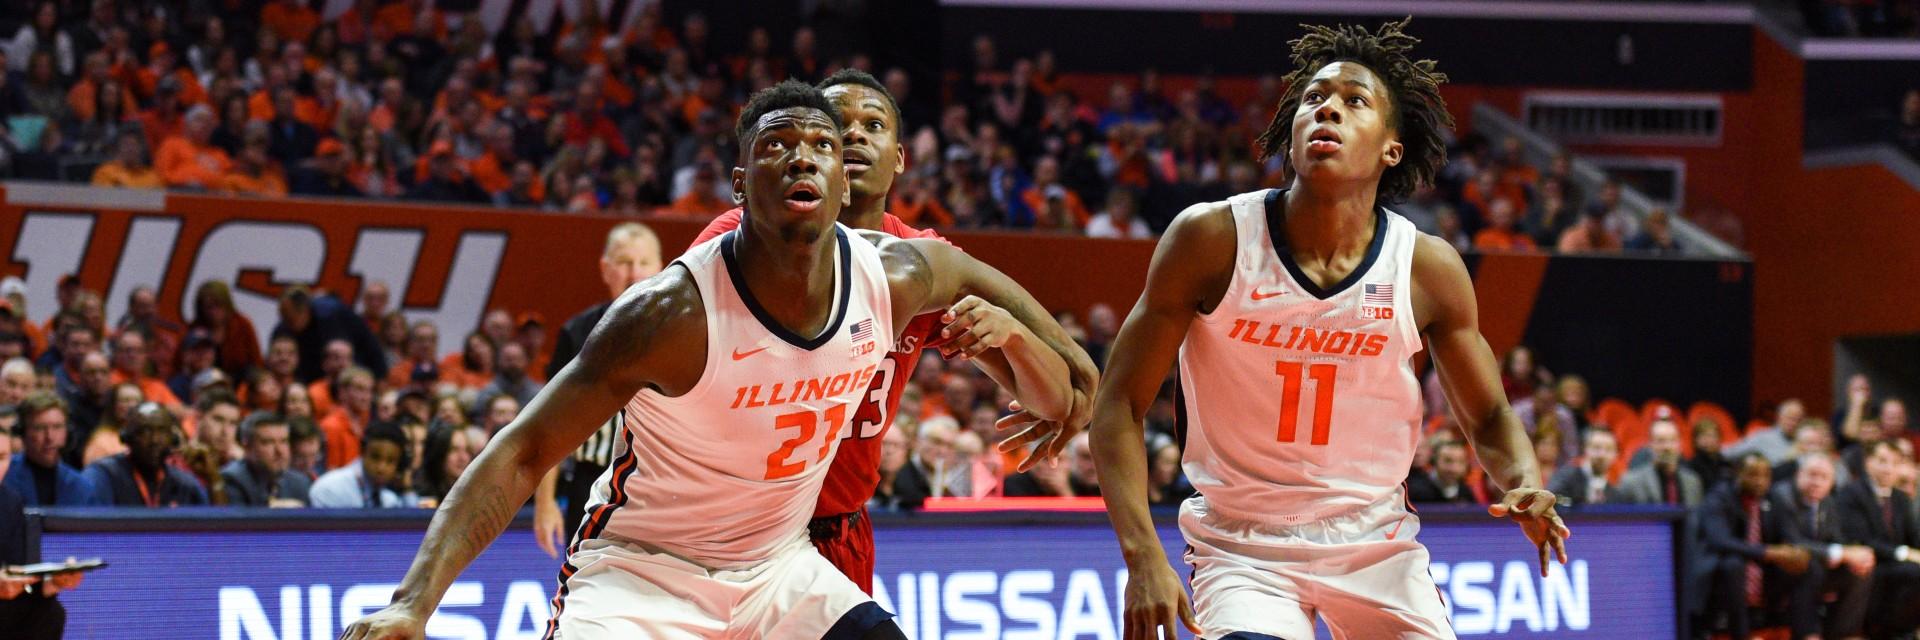 ncaa-college basketball-futures